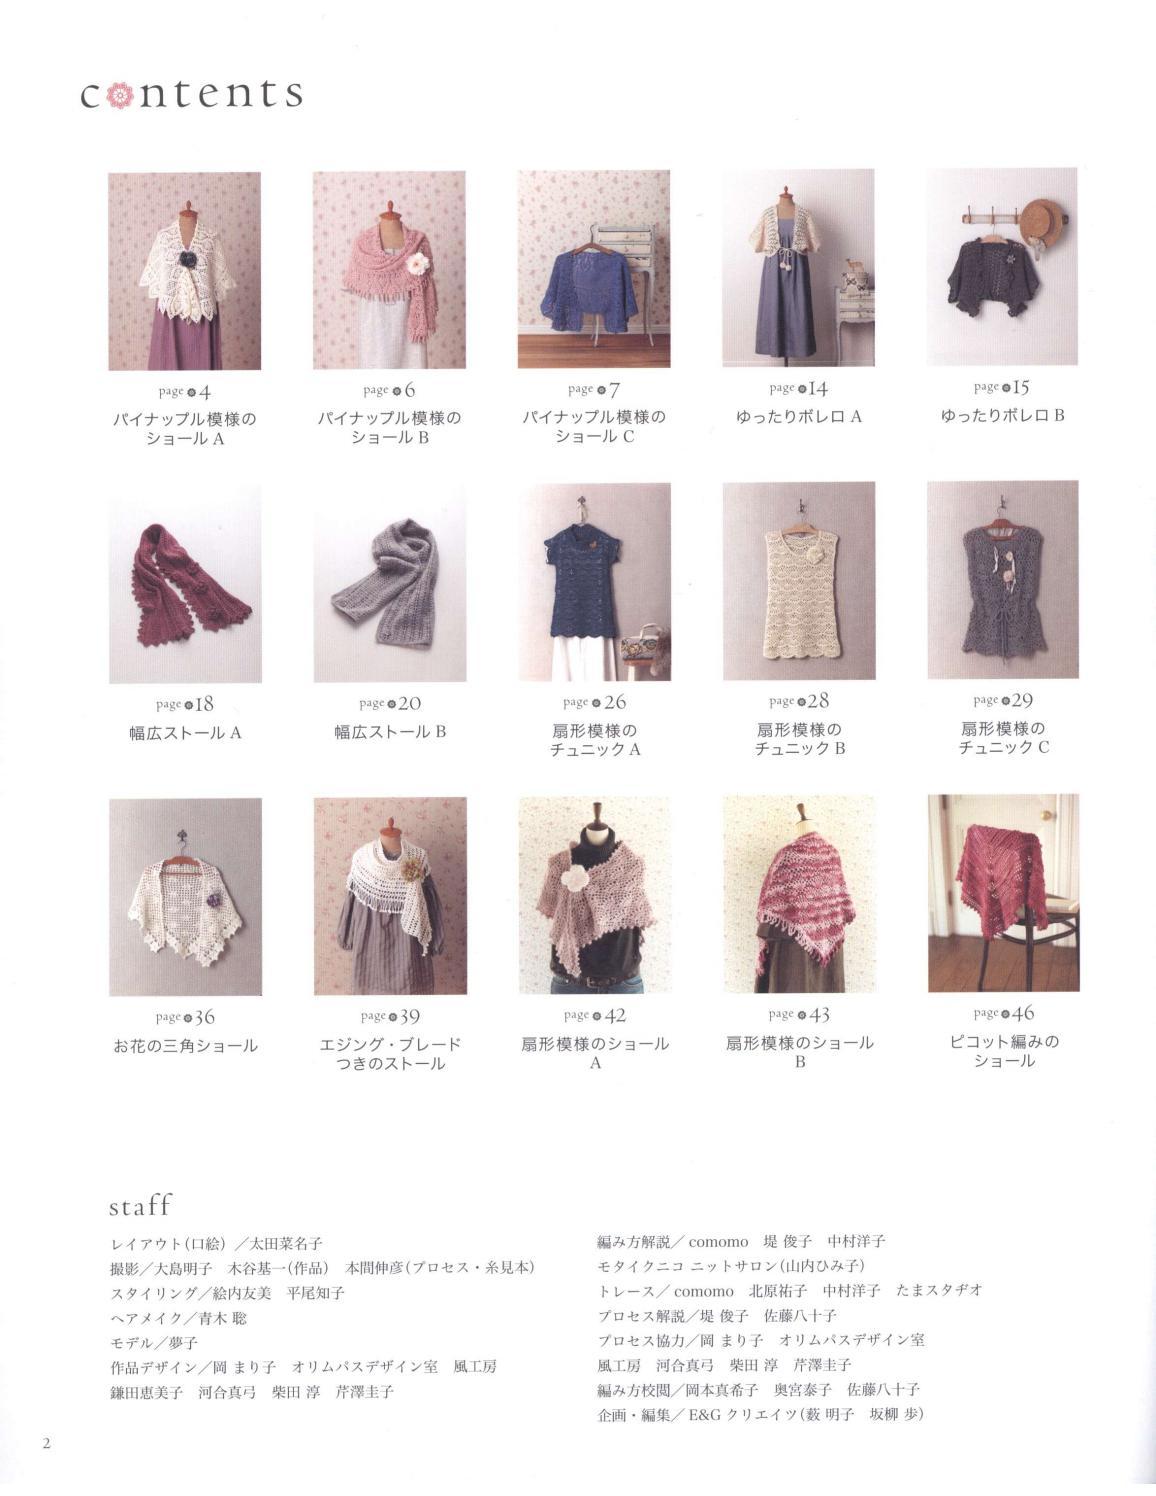 Asahi original crochet best selection 2012 page 2